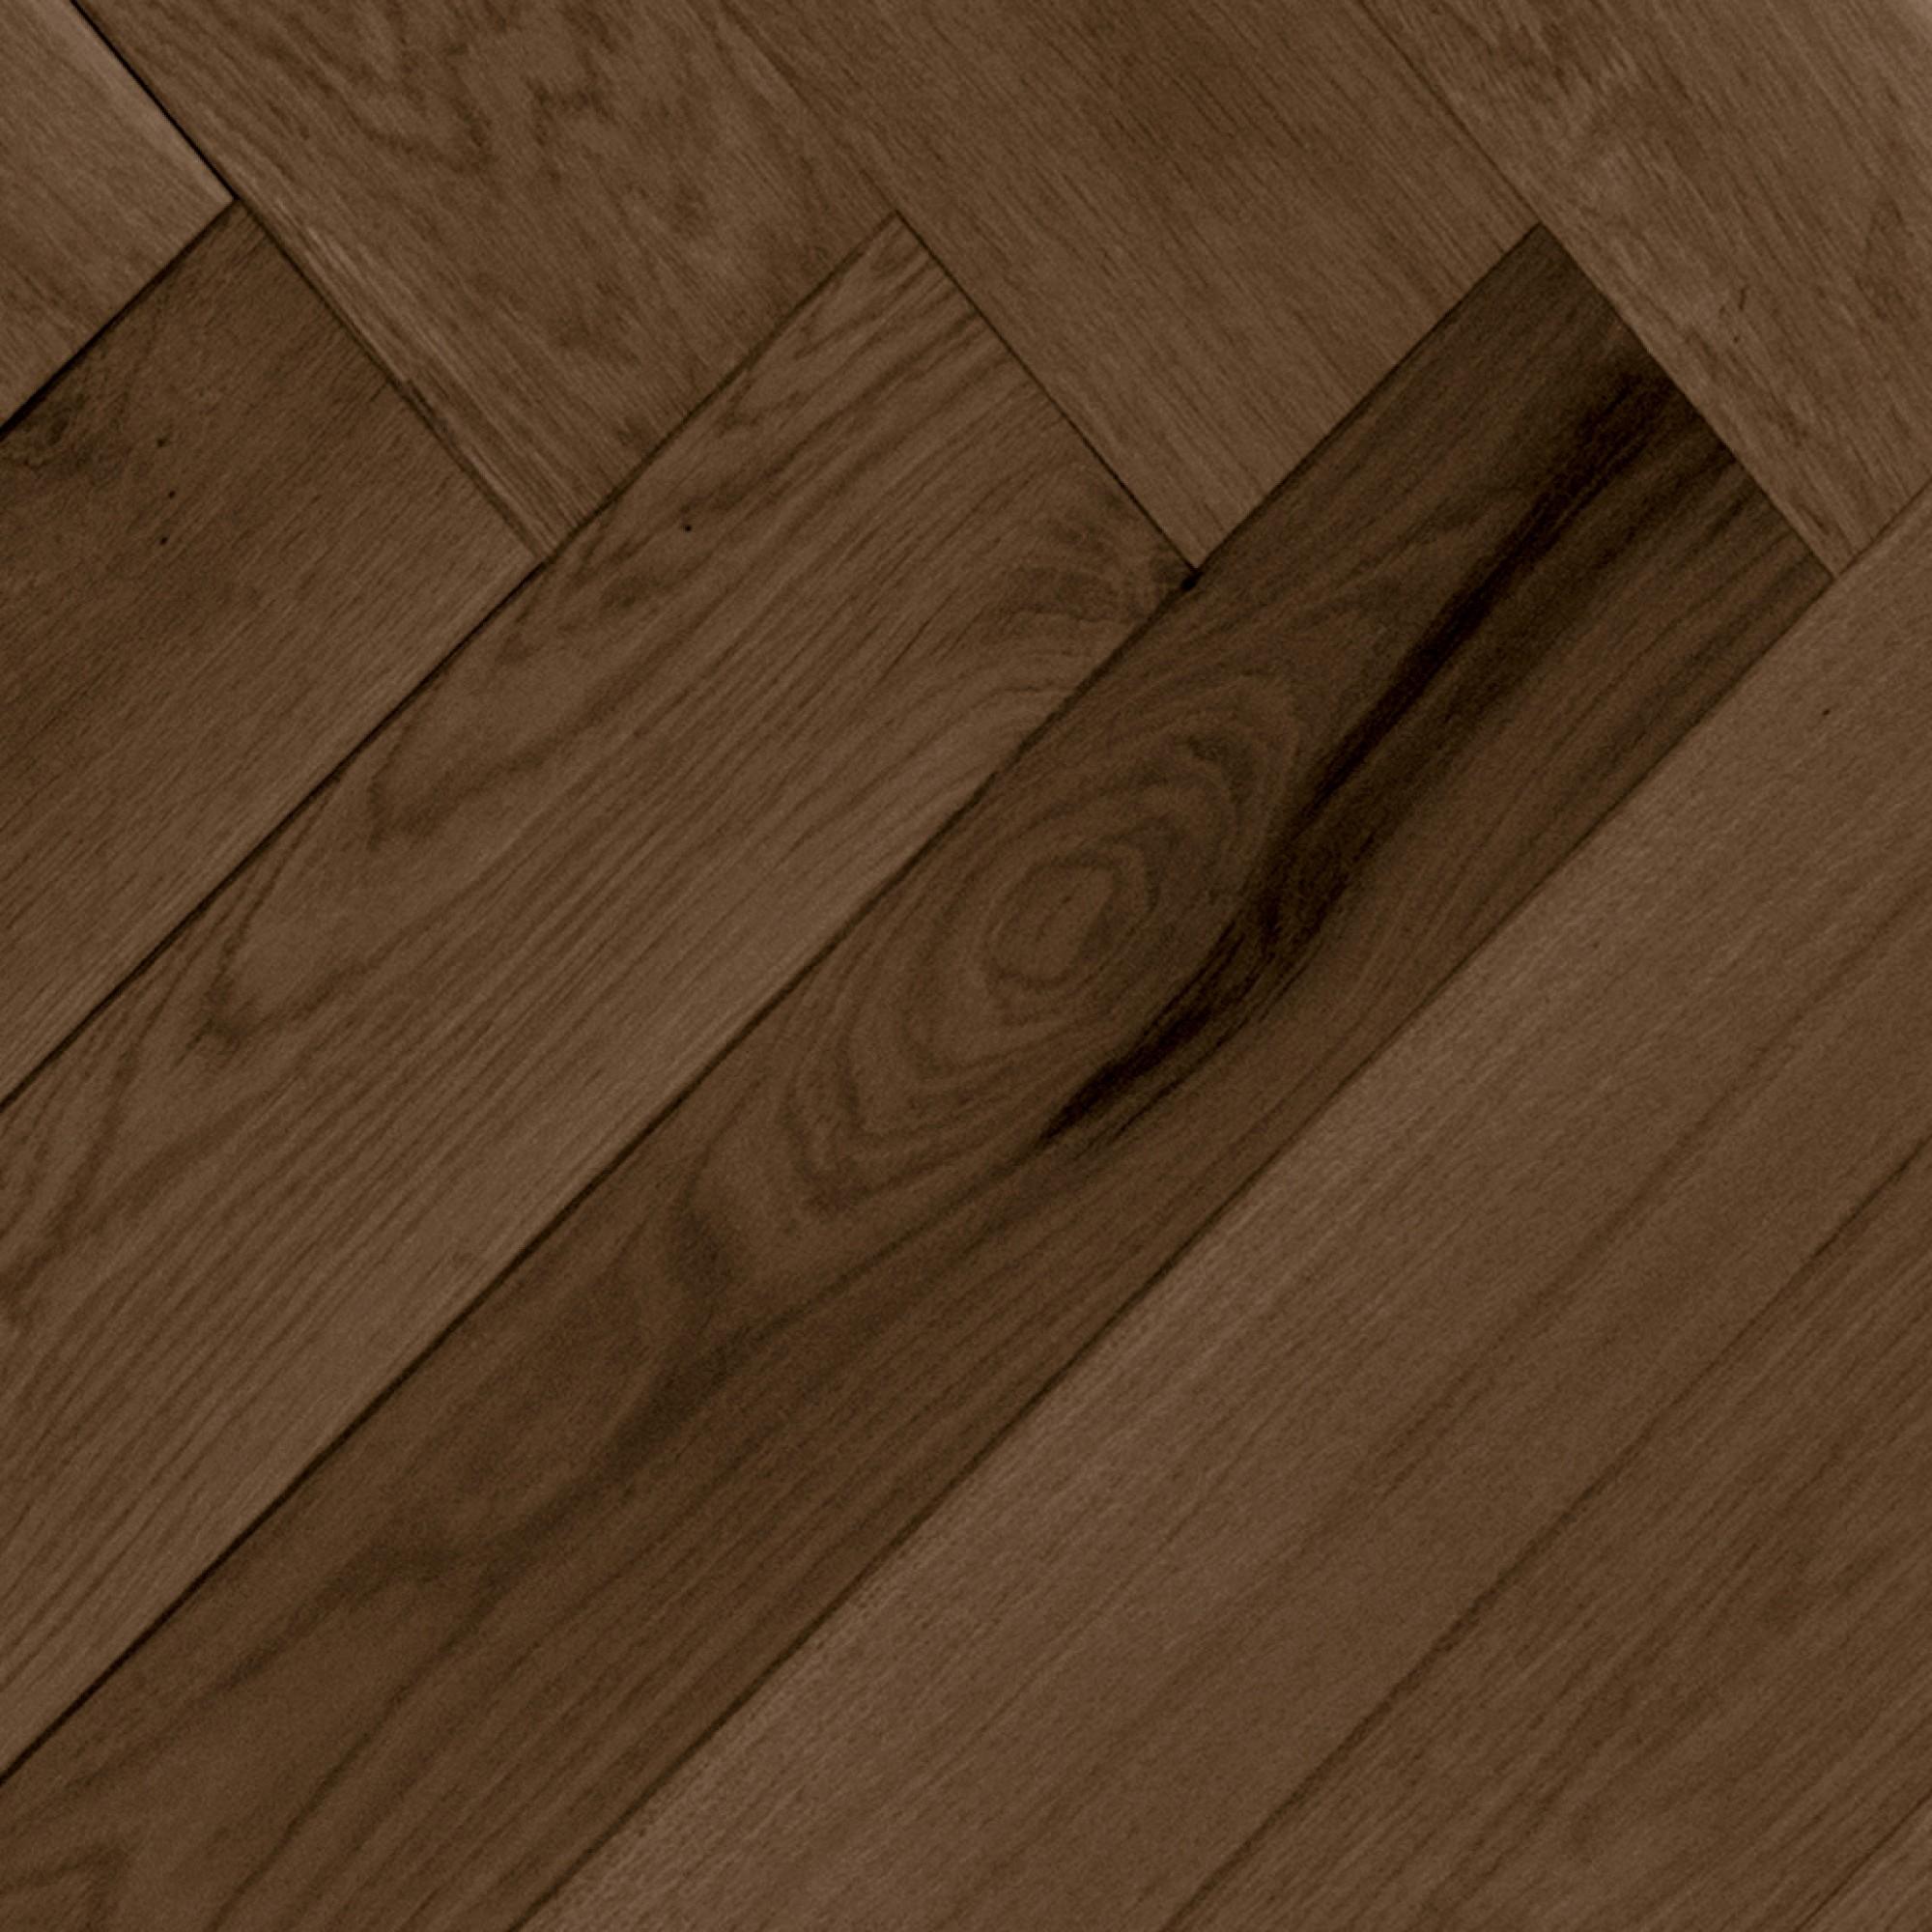 engineered floor flooring toronto bruce lauzon natural collection floors aa oak ambiance red hardwood